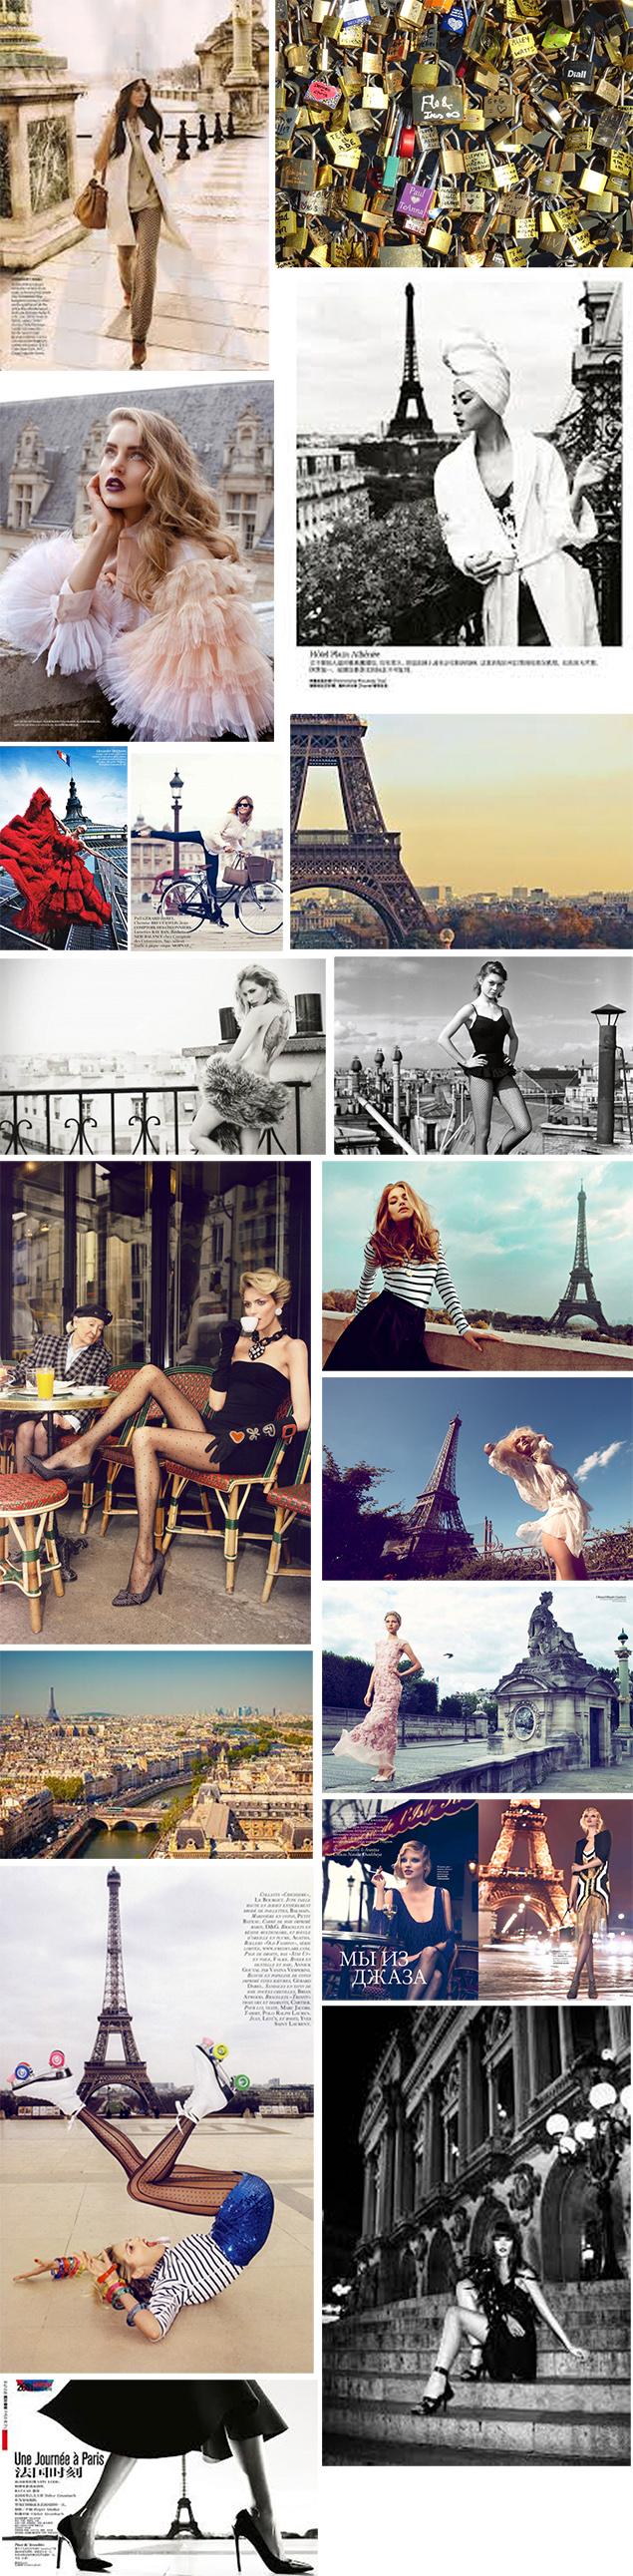 paris fashion editorial